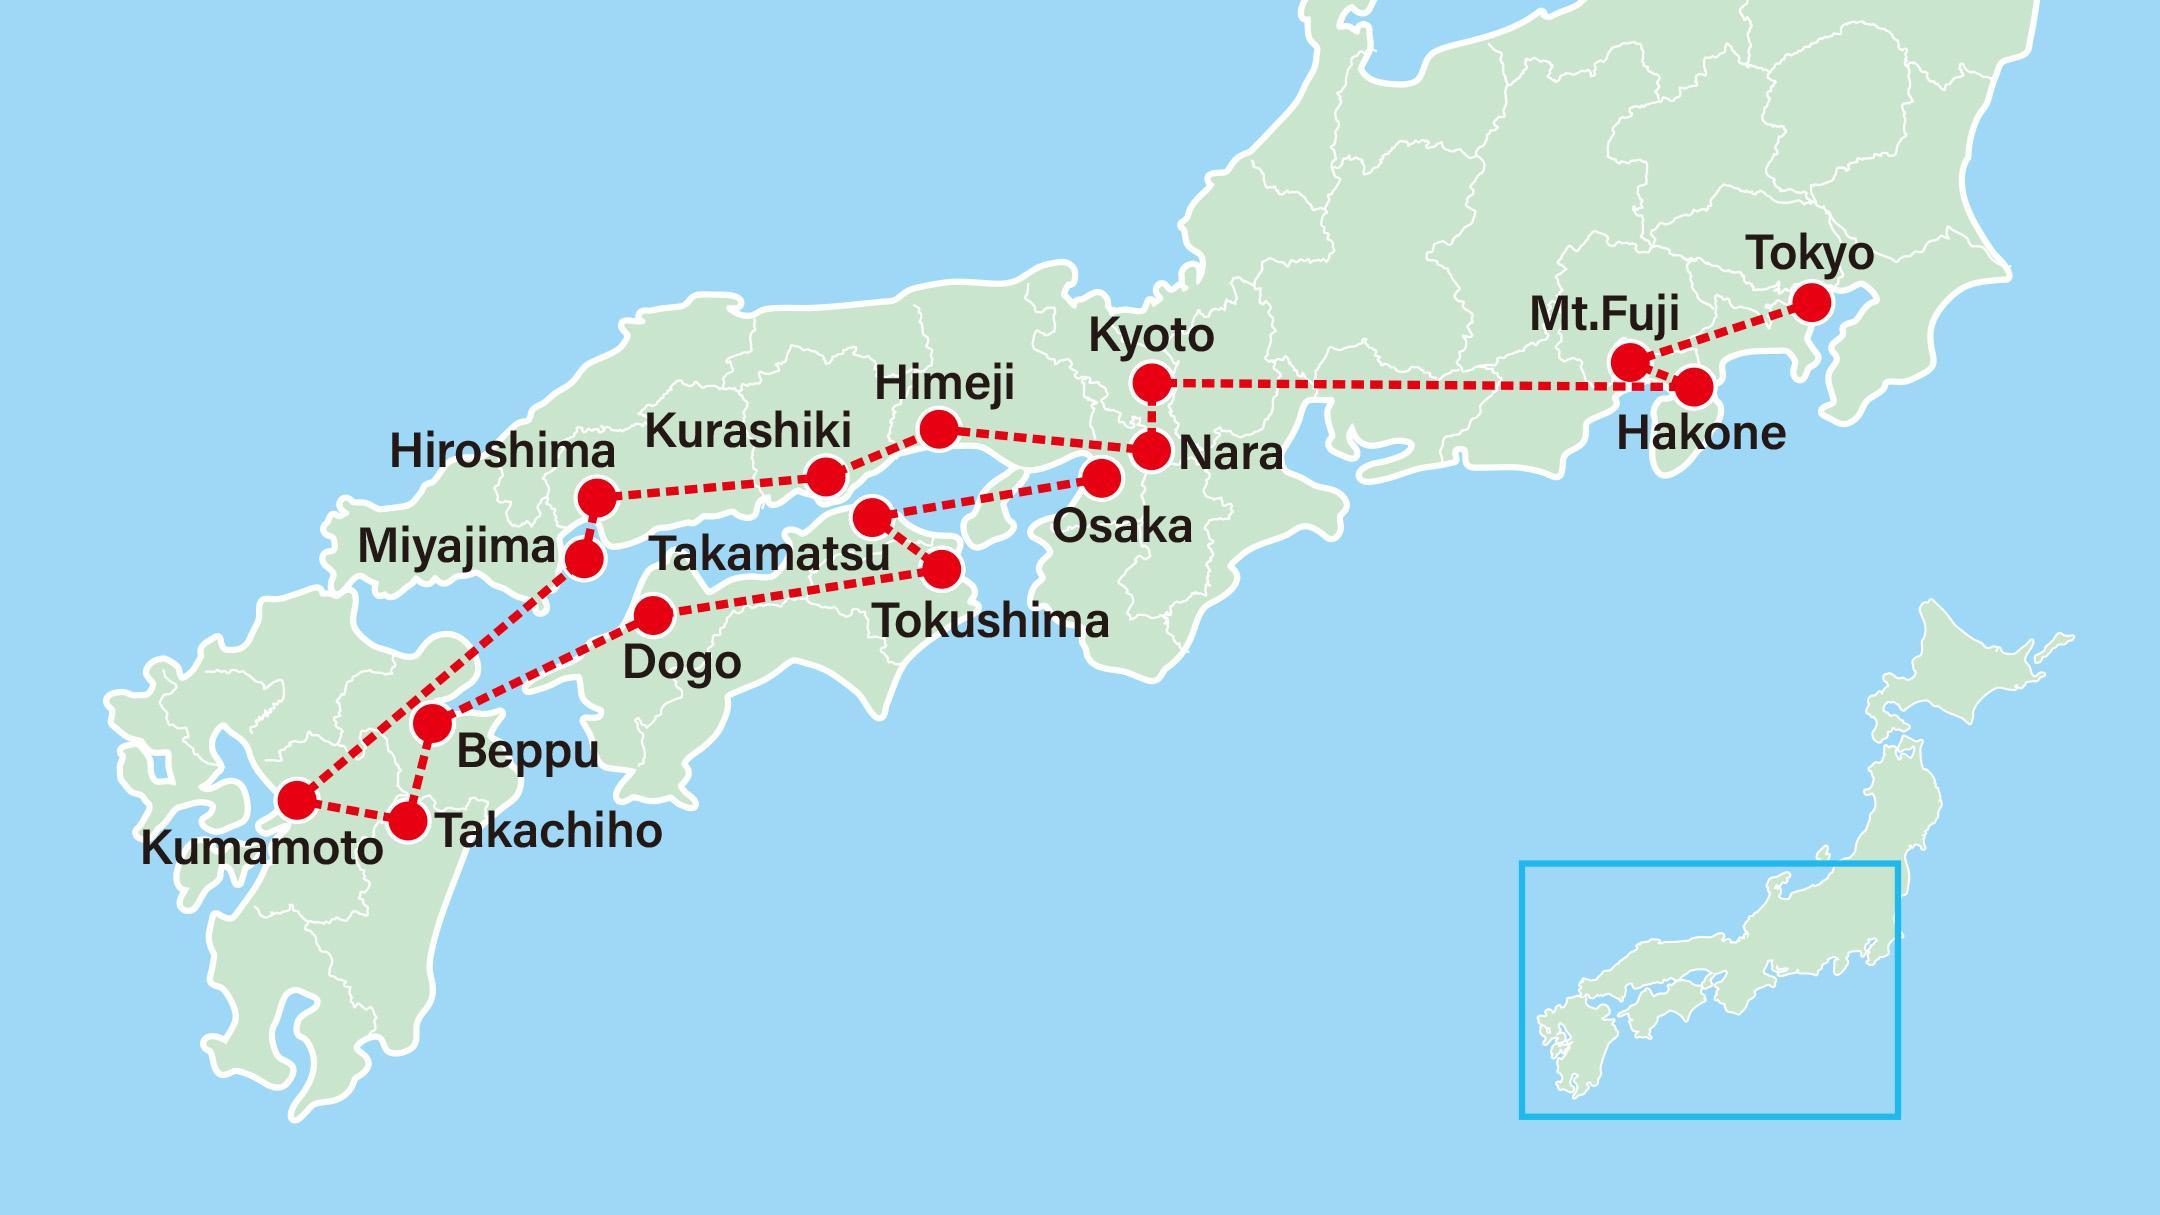 Grand Tour of Japan Ⅰ<br>Iya Valley-Tokyo-Yokohama-Mt Fuji-Hakone-Kyoto-Nara-Himeji-Kurashiki-Hiroshima-Miyajima-Kumamoto-Takachiho-Beppu-Dogo-Tokushima-Ritsurin Garden-Osaka